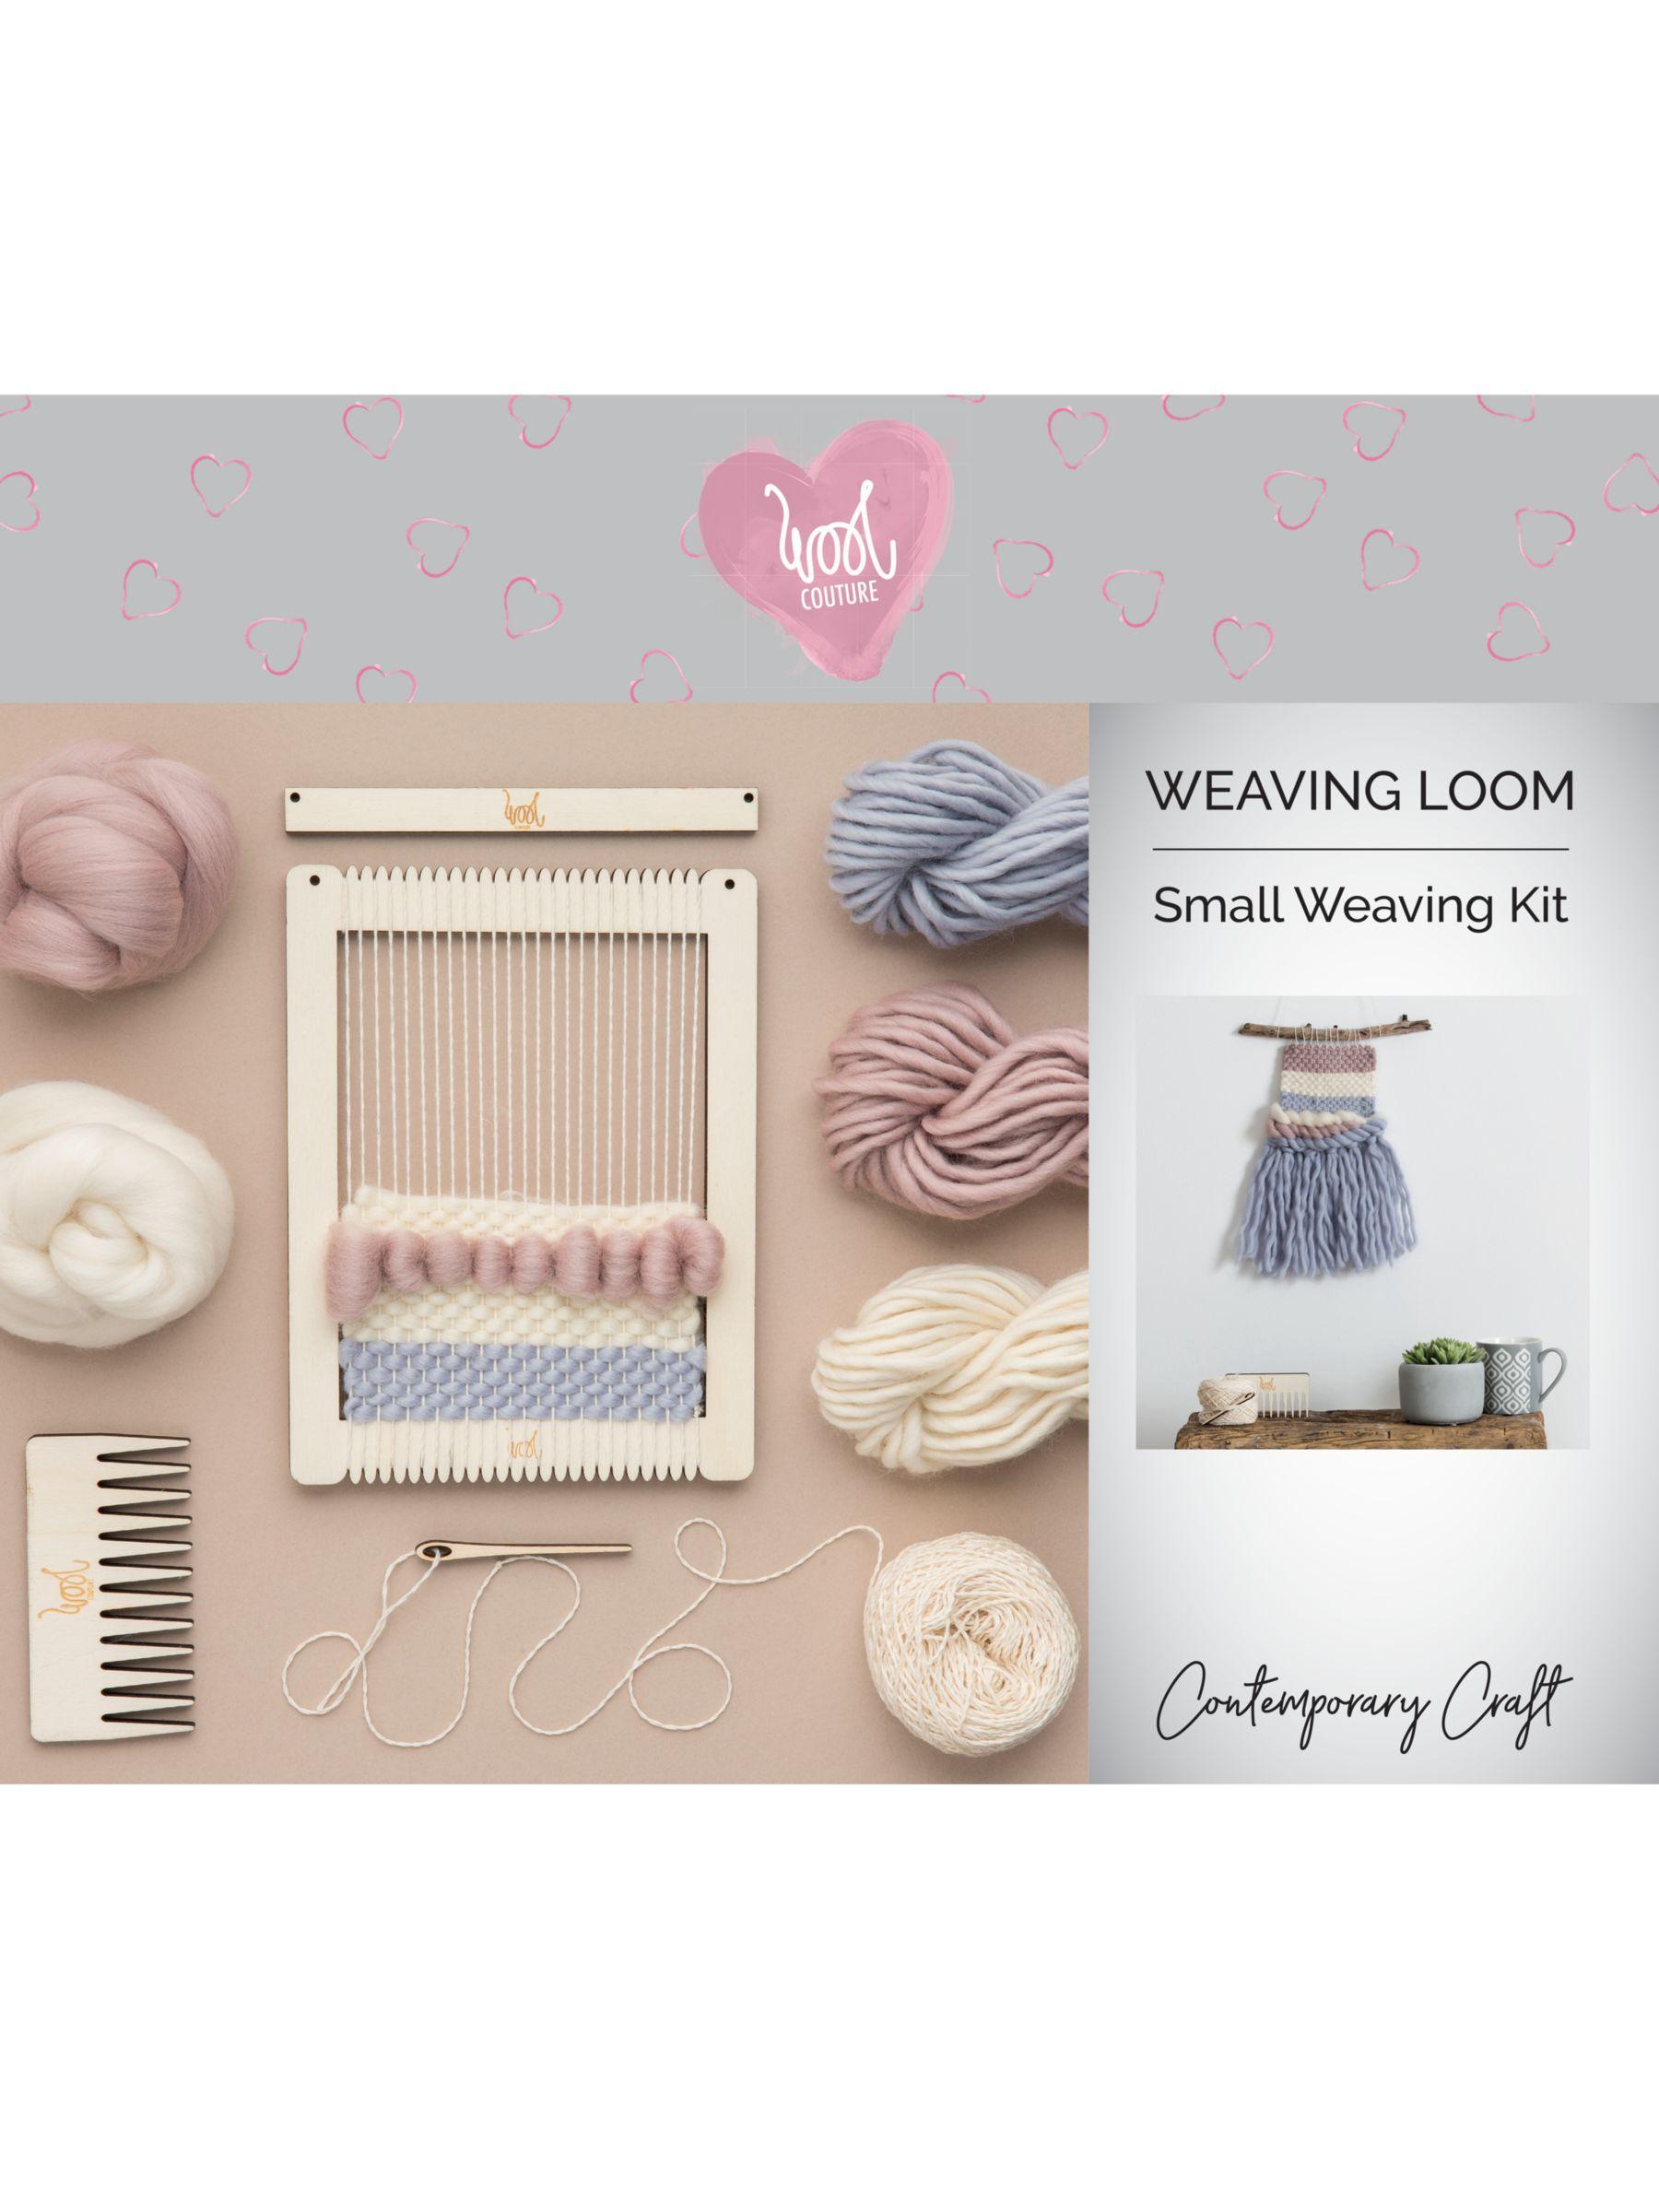 Small weaving